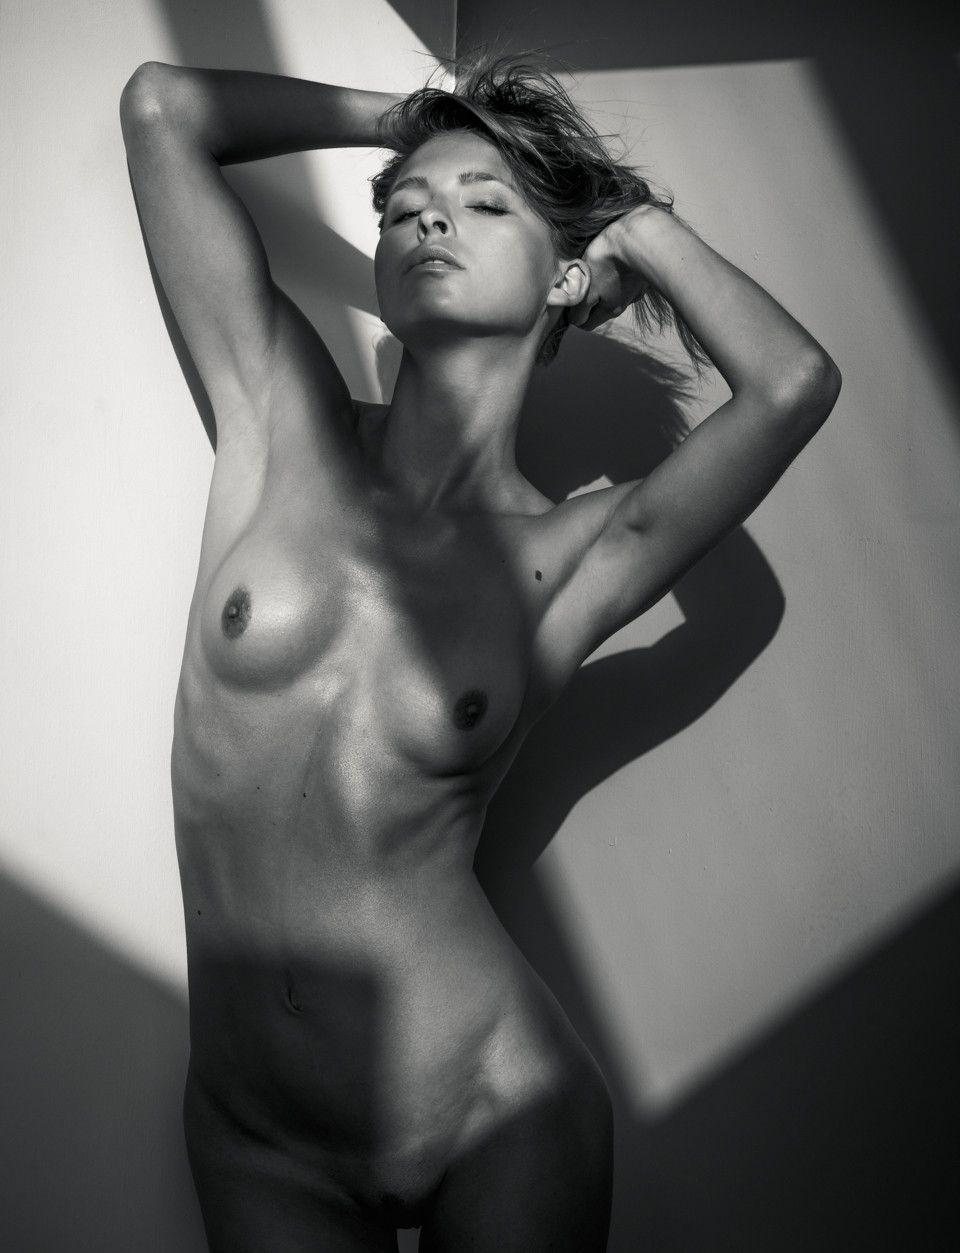 marisa-papen-Nude-Photos-28-thefappeningblog.com_.jpg